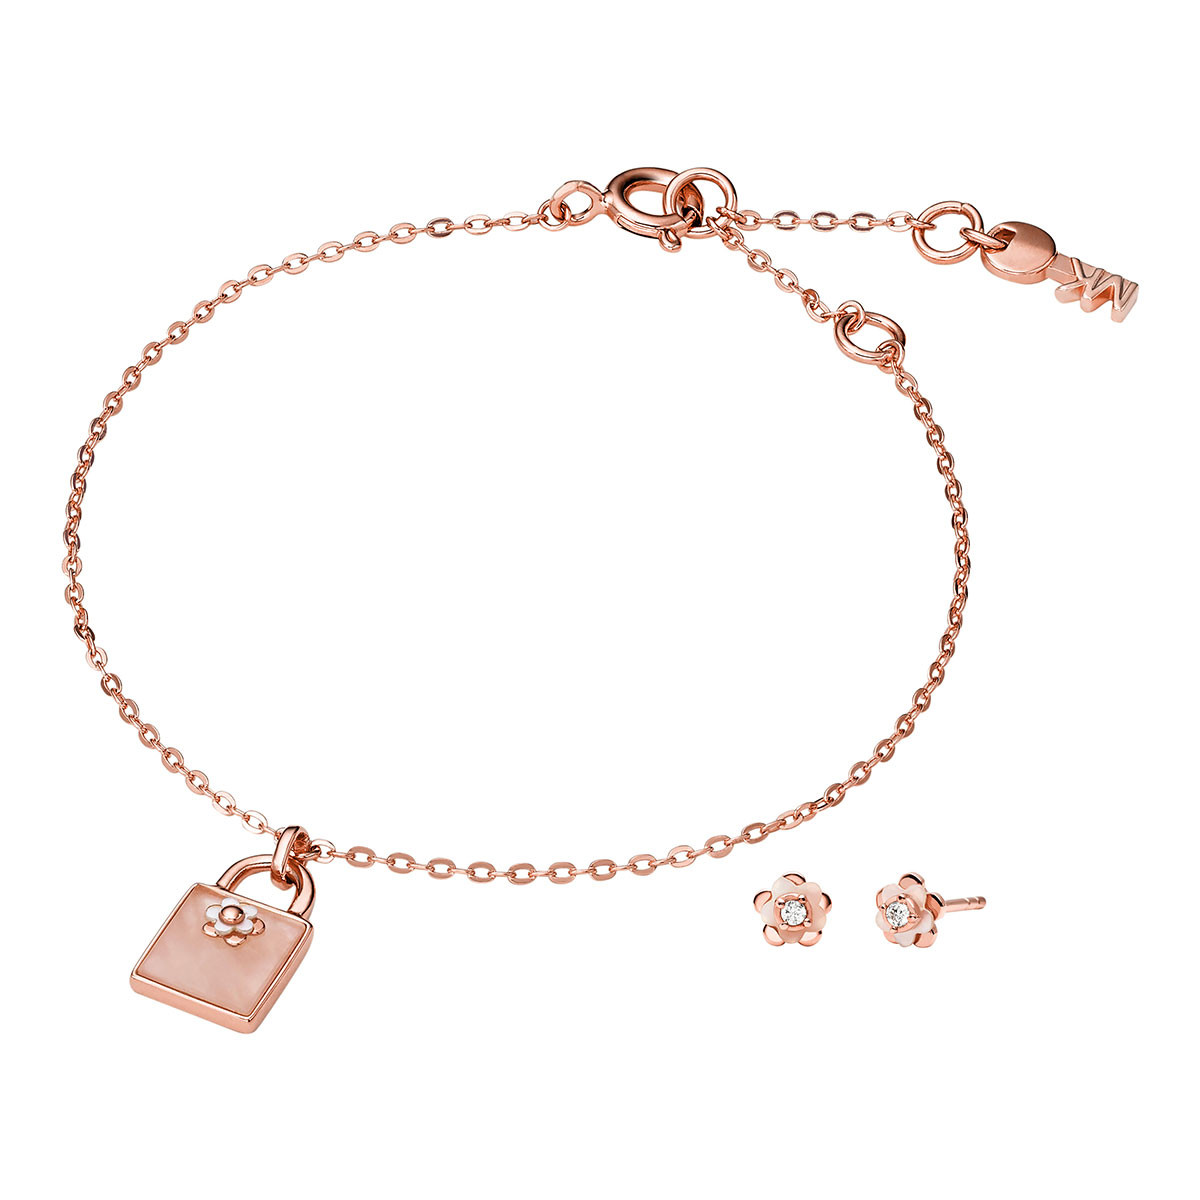 Michael Kors Armband - MKC1194AB791 Premium Set Roségold - in gold - für Damen